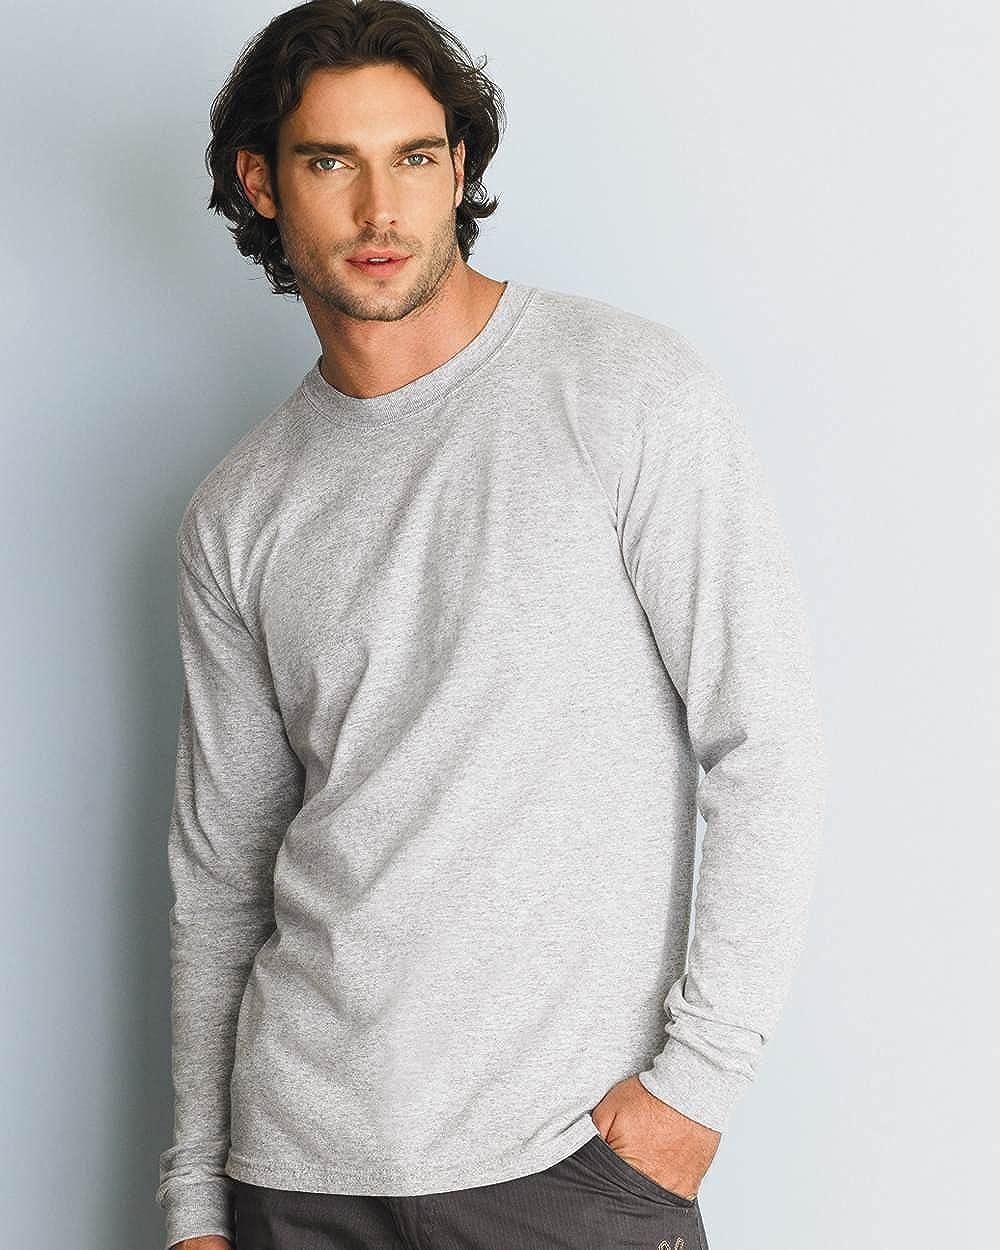 Halloween KostŸm, Leuchtet im Dunkeln auf American American American Apparel Fine Jersey Shirt 31325d